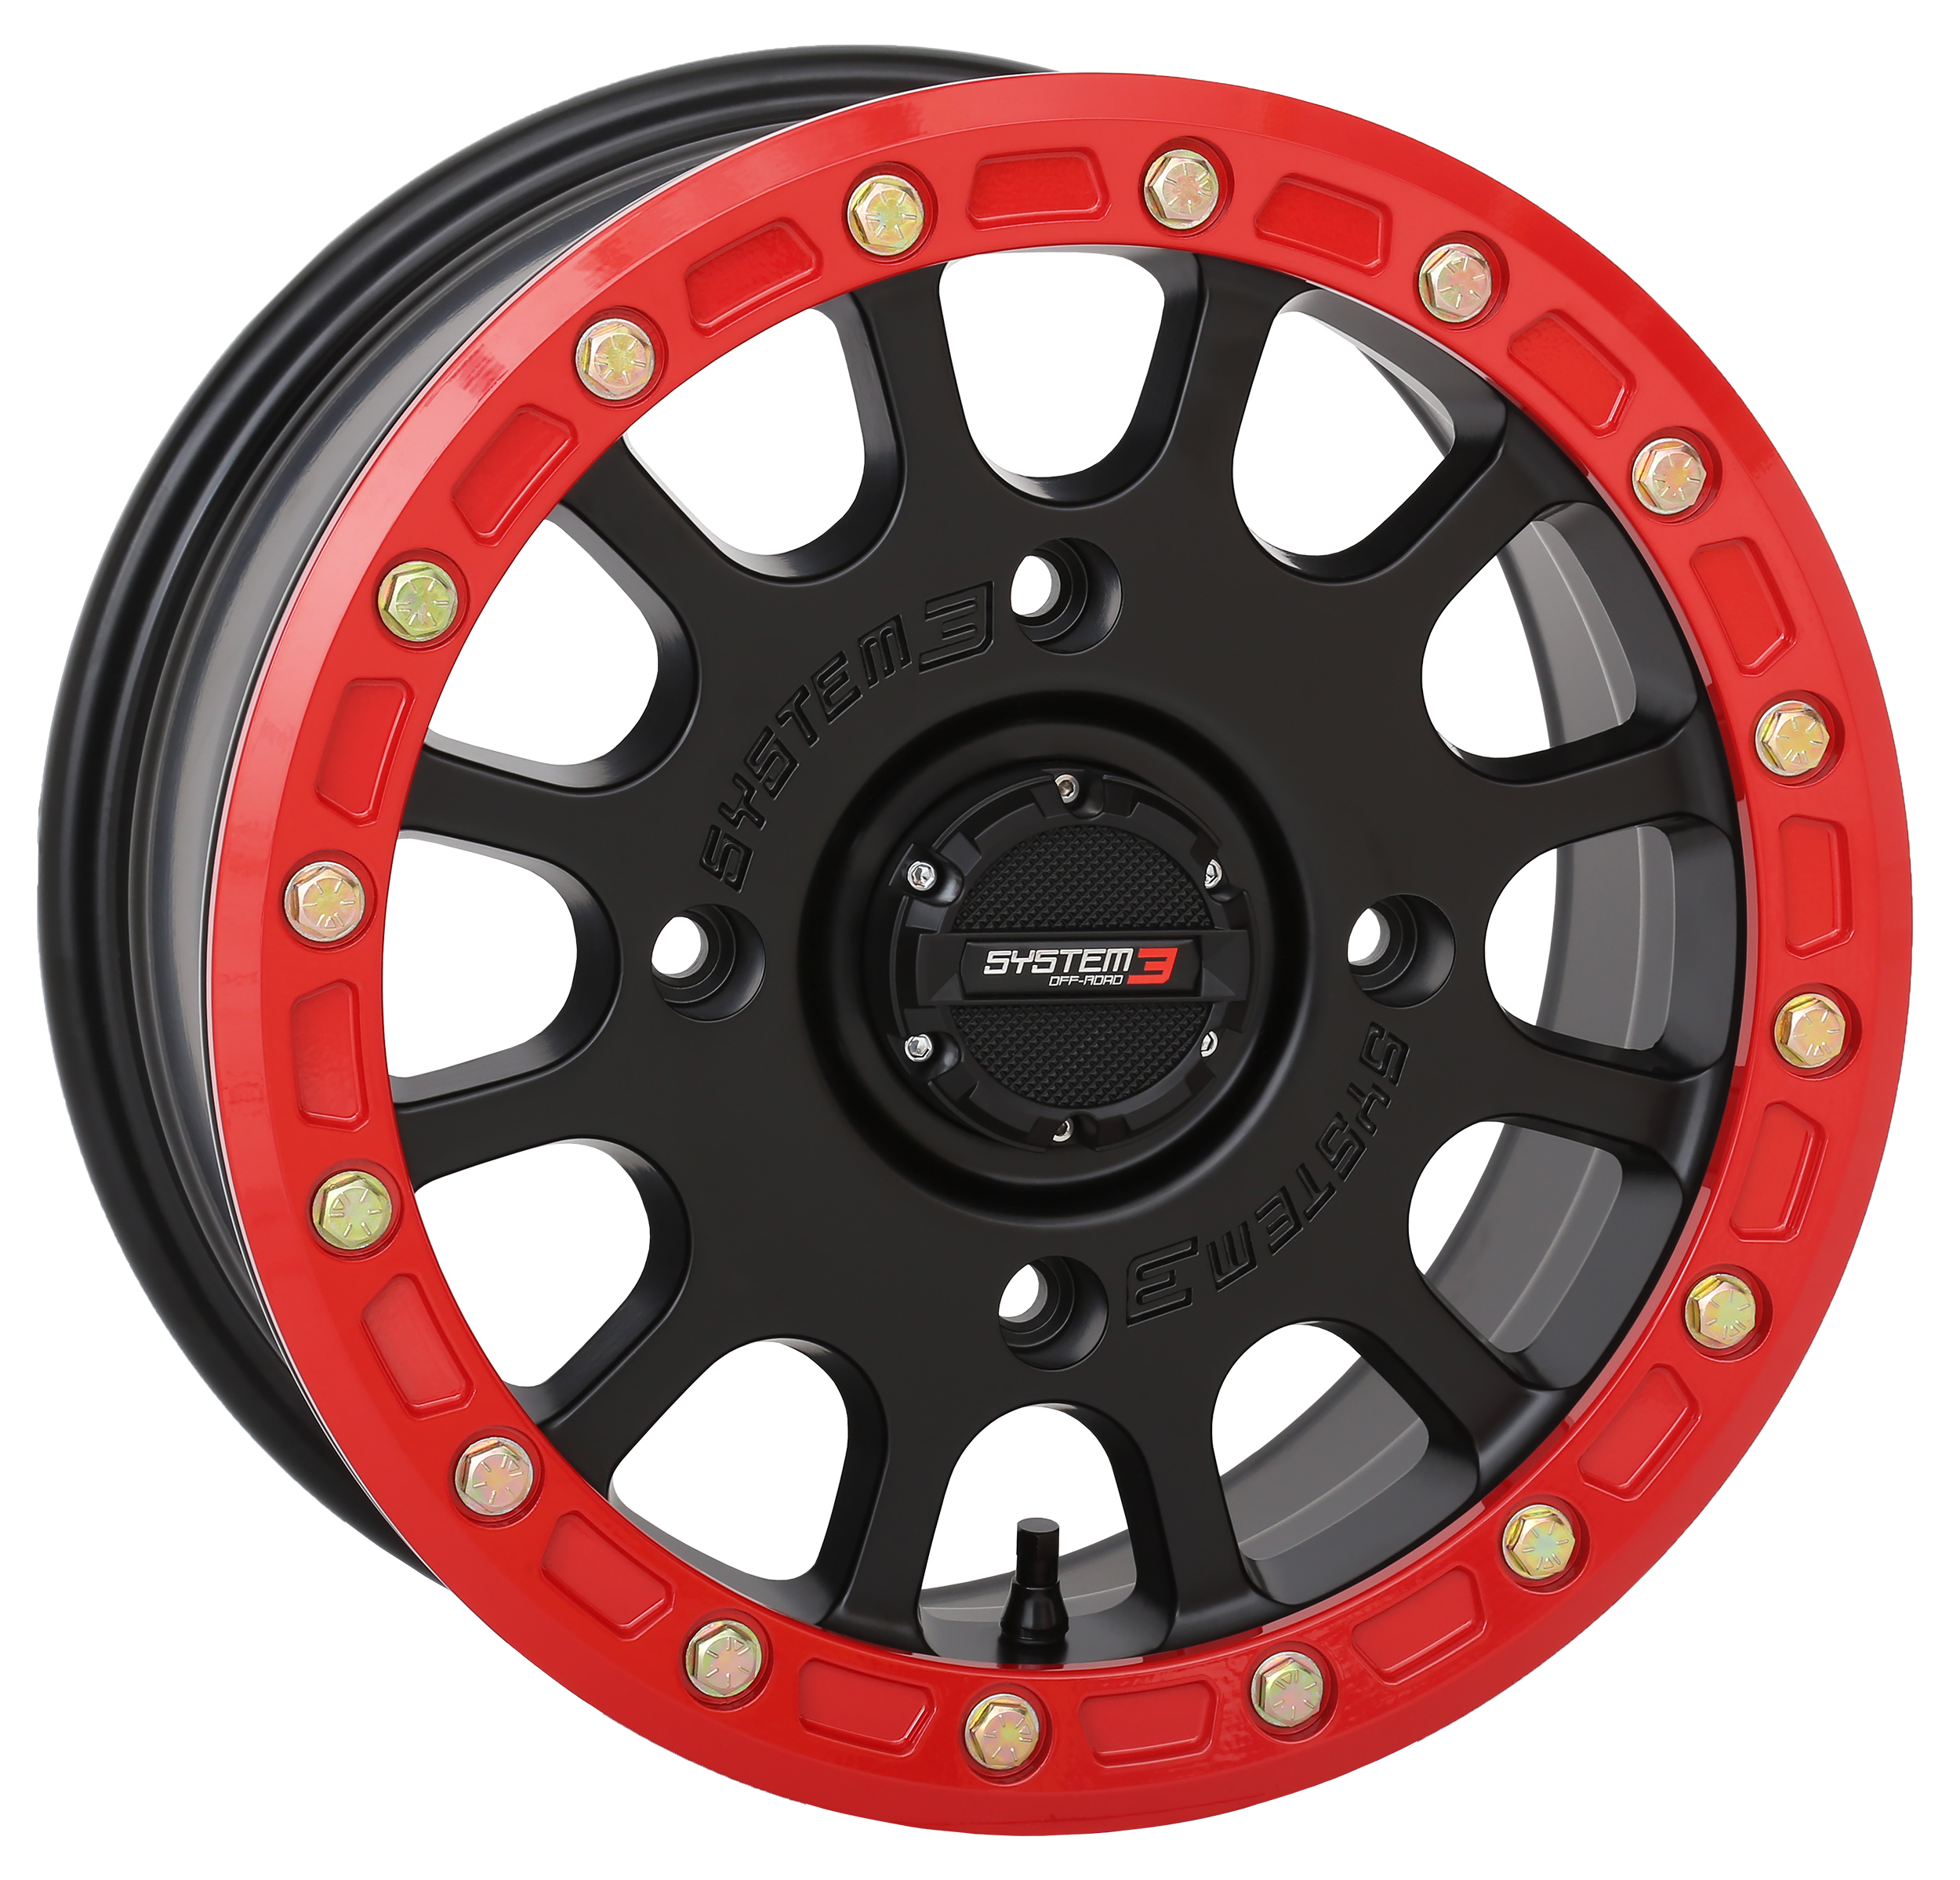 200304 System 3 SB-5 Black red ring